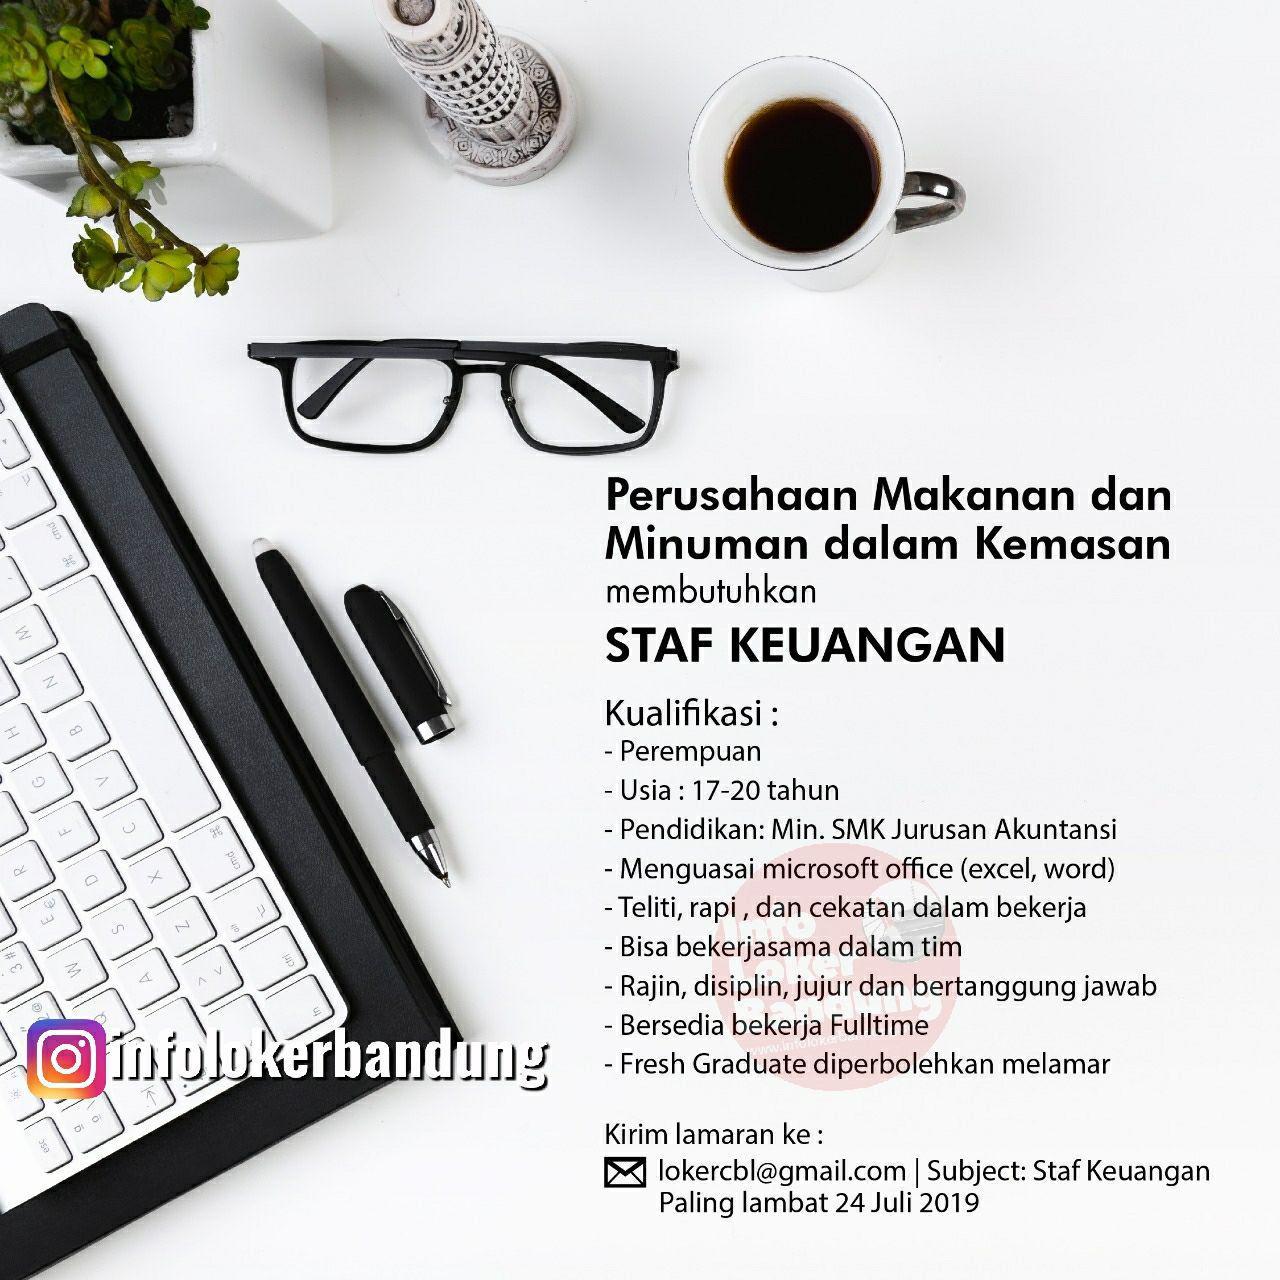 Lowongan Kerja Staf Keuangan Addictea Bandung Juli 2019